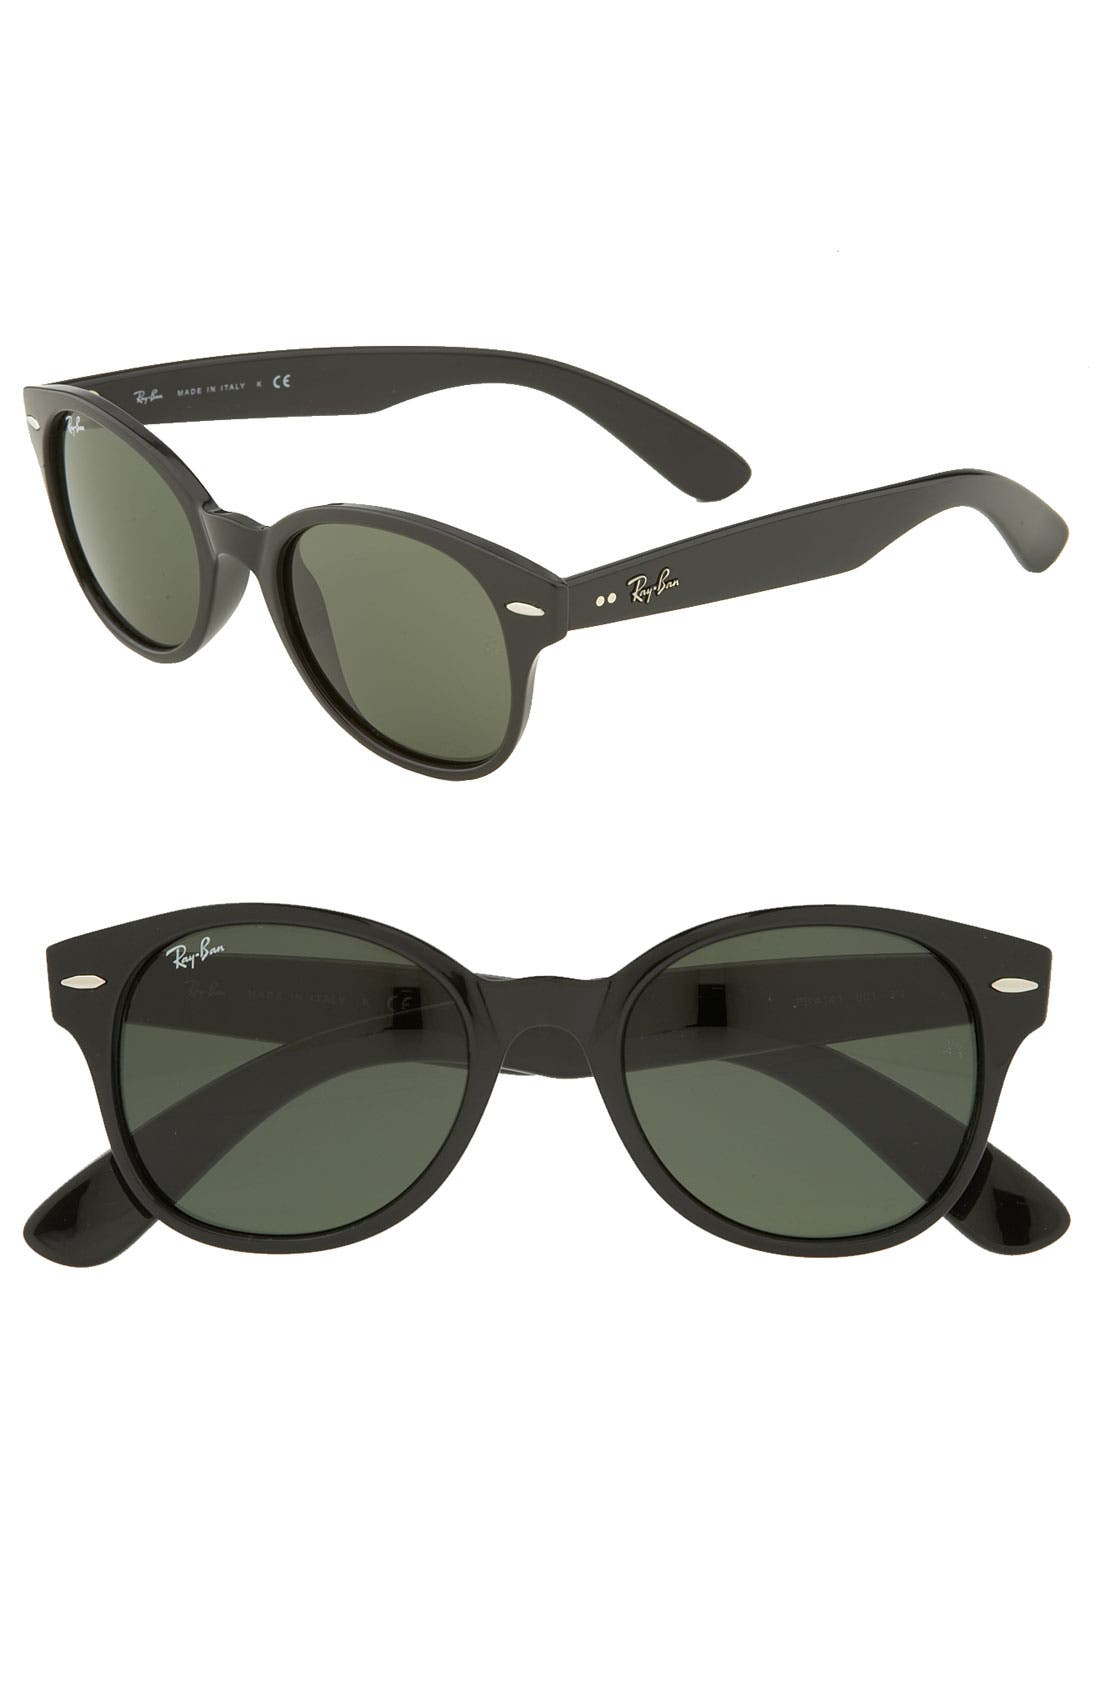 Alternate Image 1 Selected - Ray-Ban 'High Street Wayfarer' Sunglasses